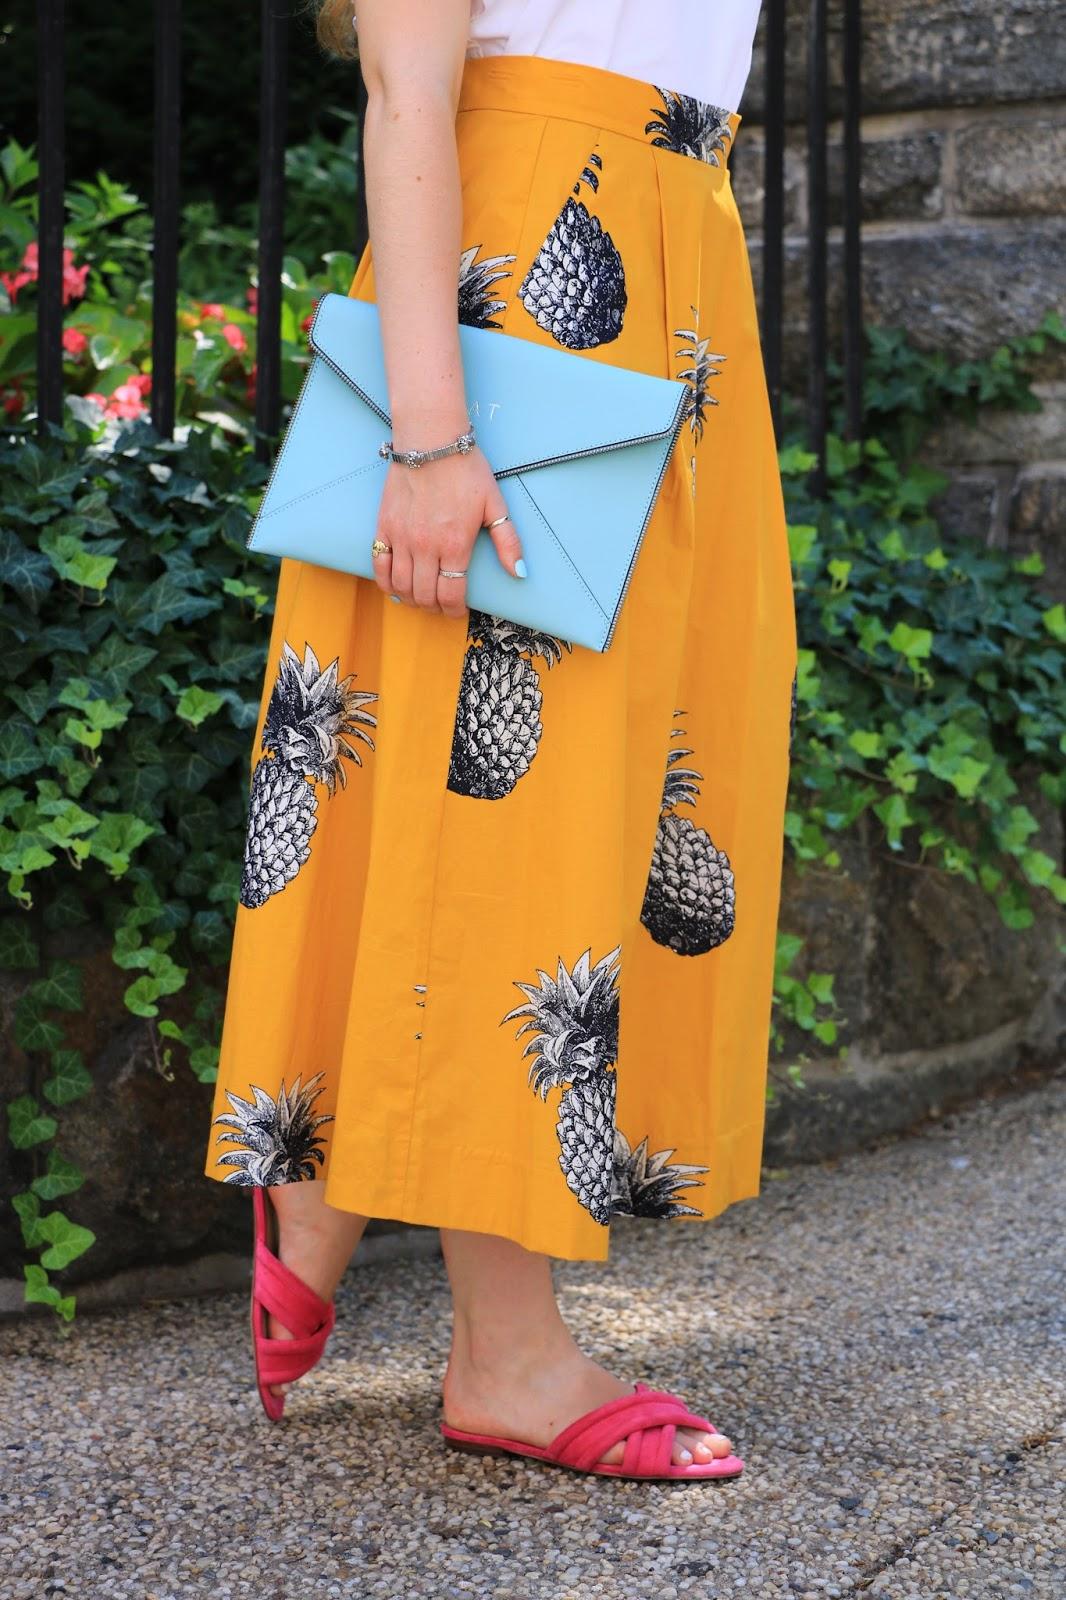 Fashion blogger Kathleen Harper wearing a pineapple skirt with pink slides